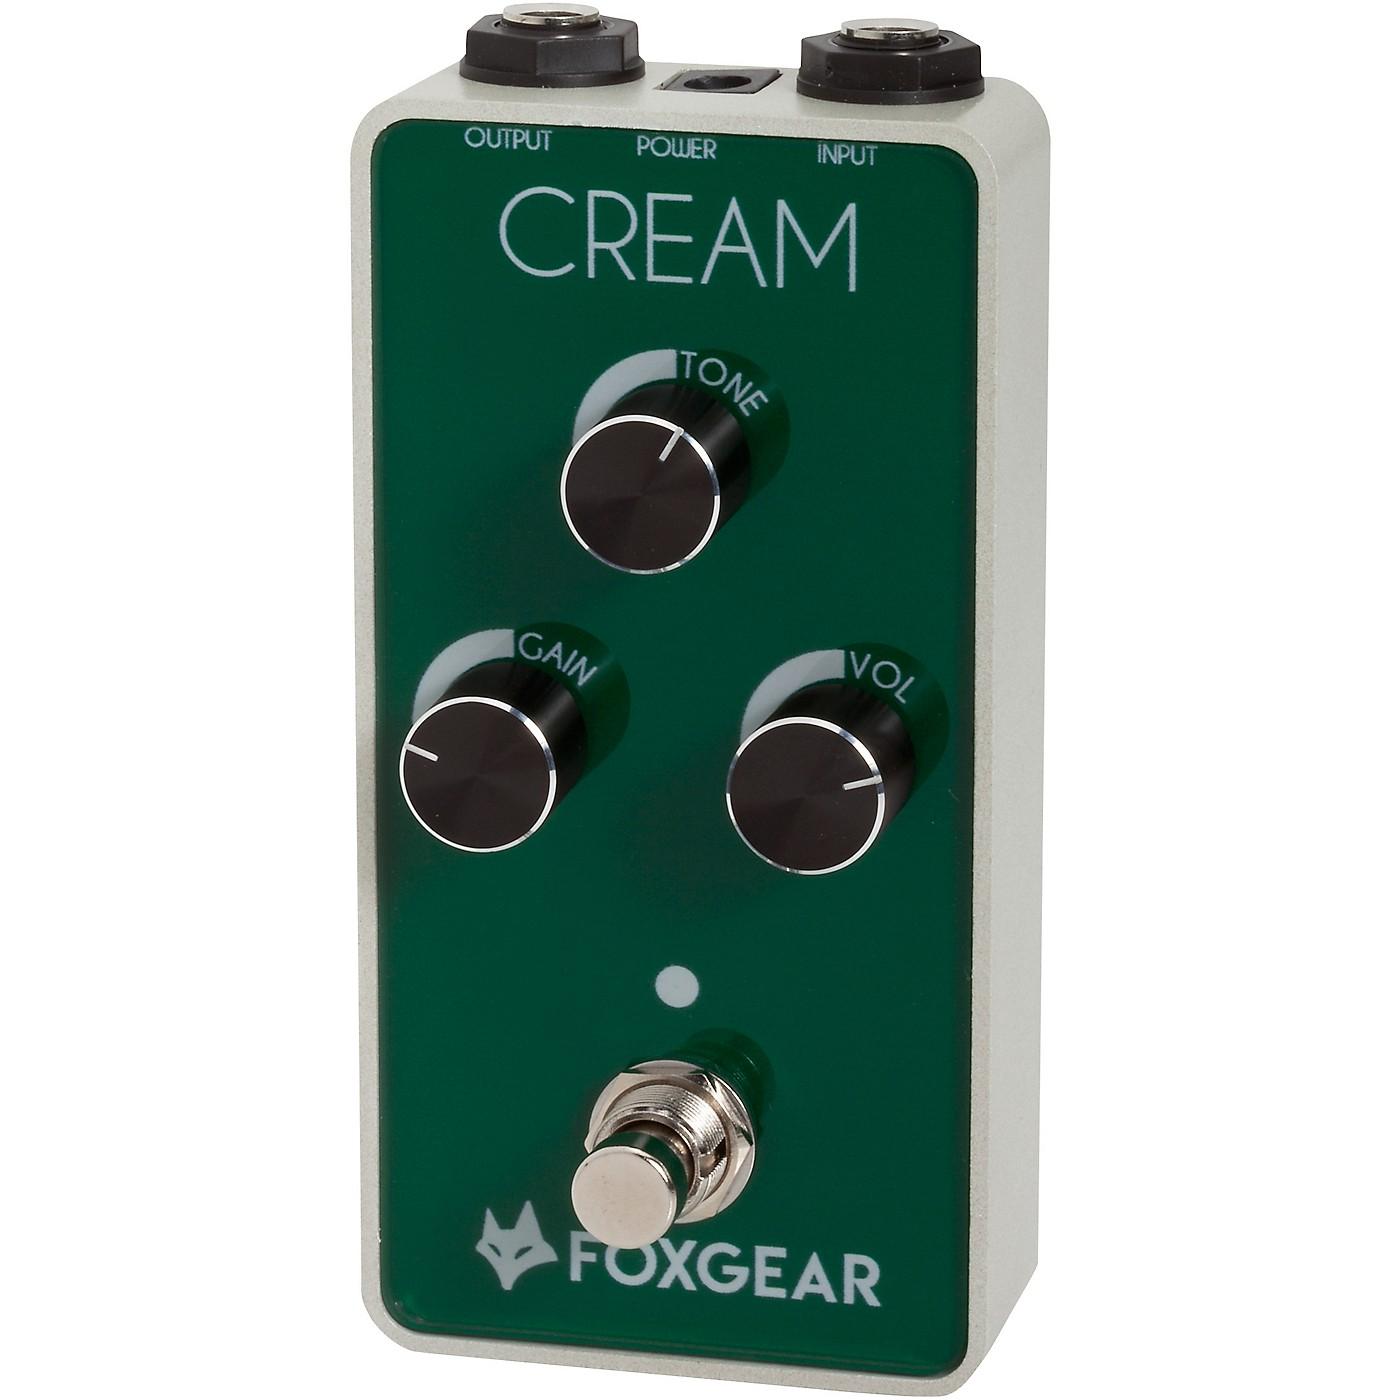 FoxGear Cream Screaming Overdrive Effects Pedal thumbnail